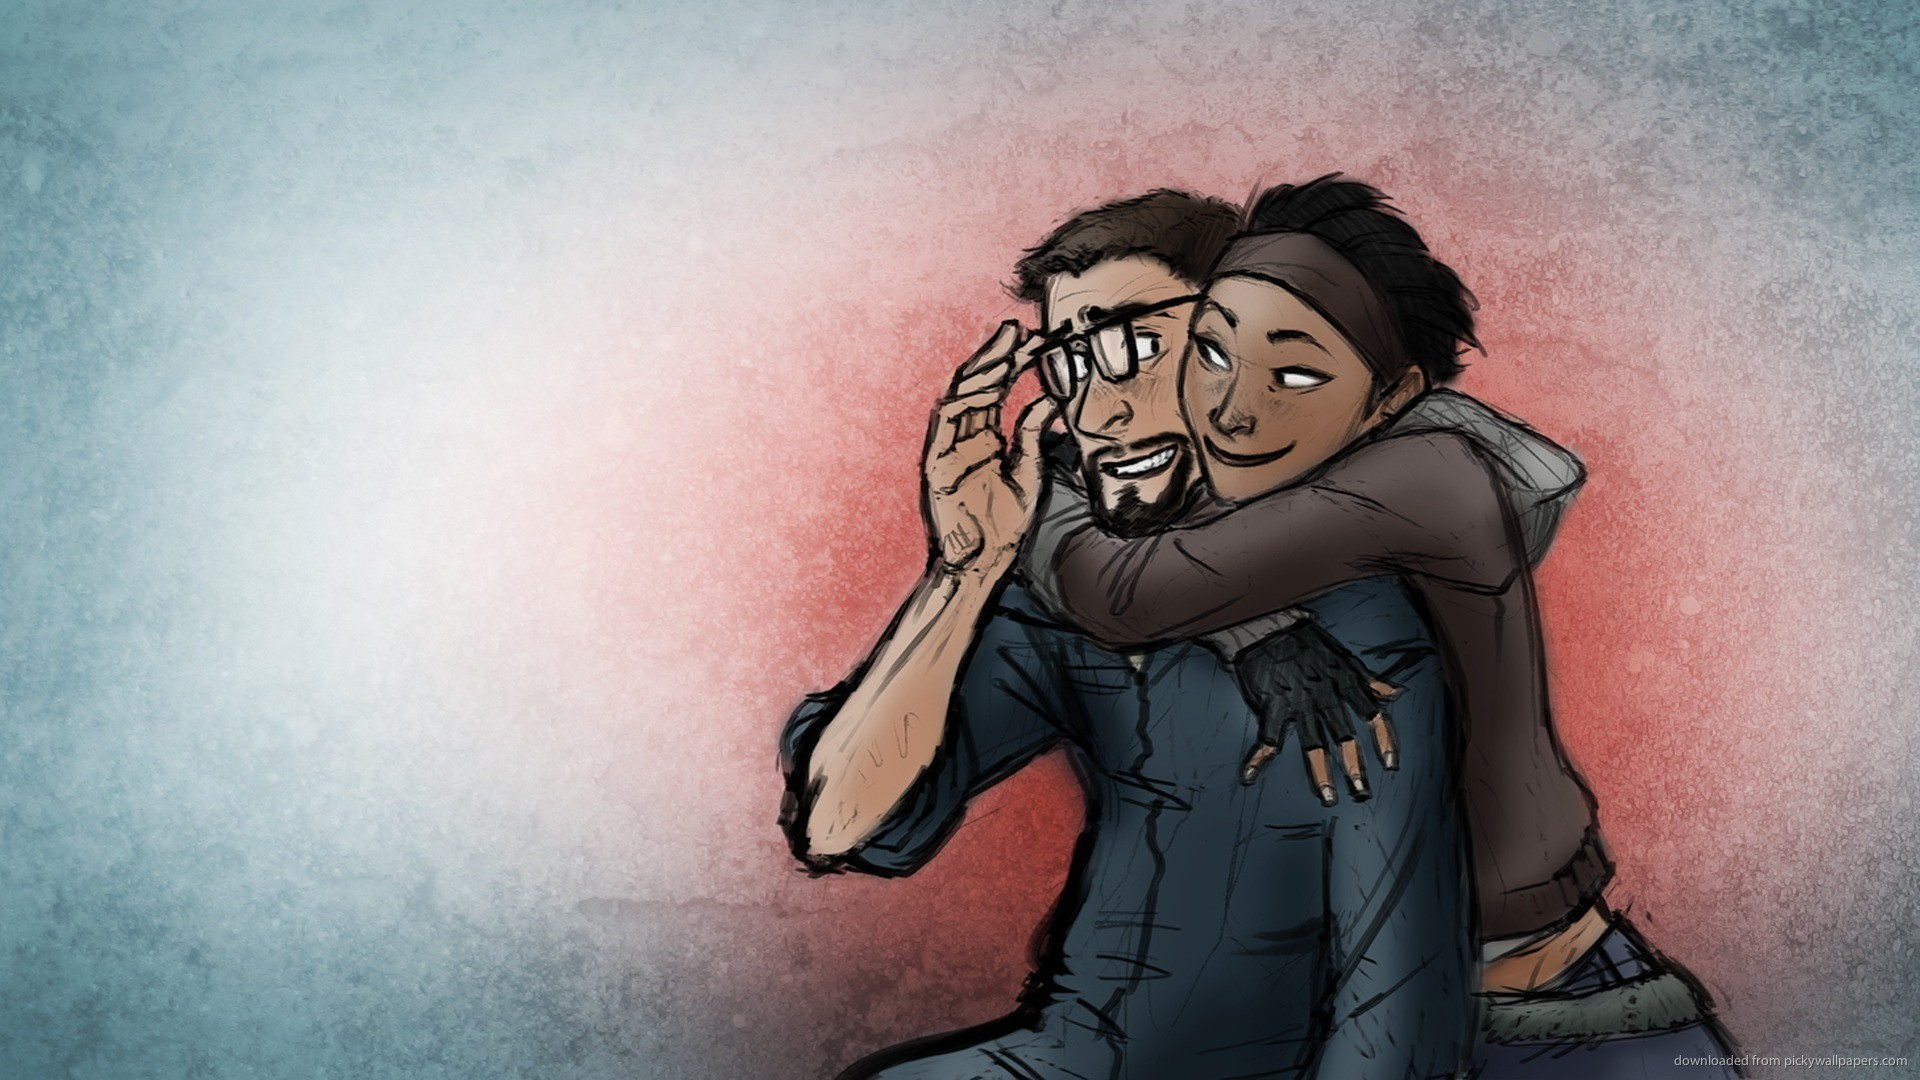 HD Half-Life 2 cute hug art wallpaper